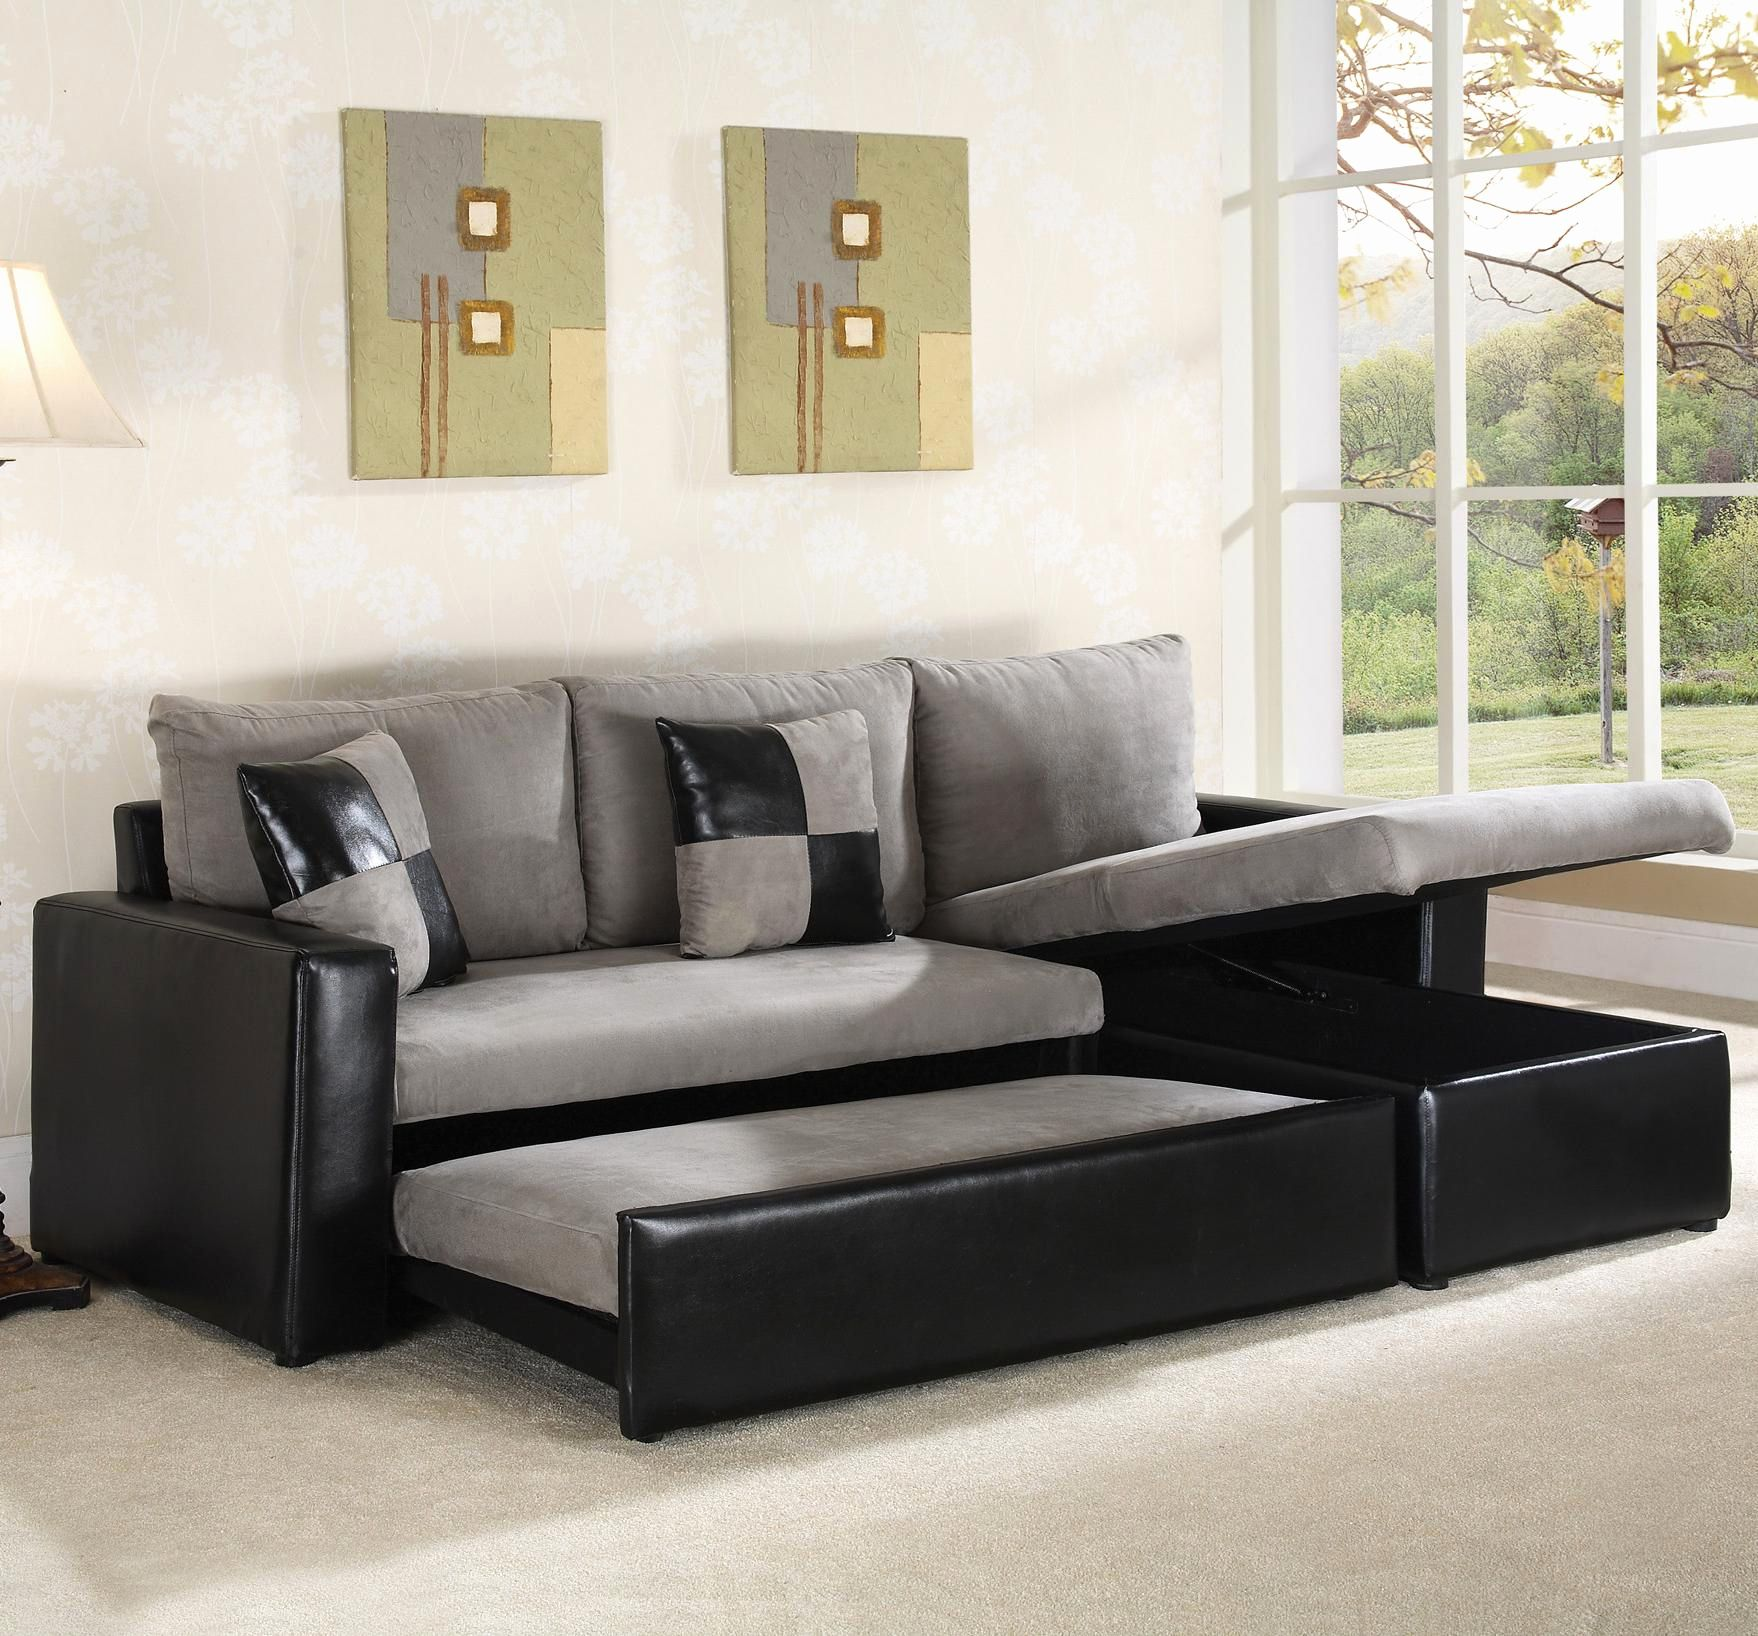 Most Comfortable Sofa Sleeper Lovely Wonderful Sleeper Sofas Ideas